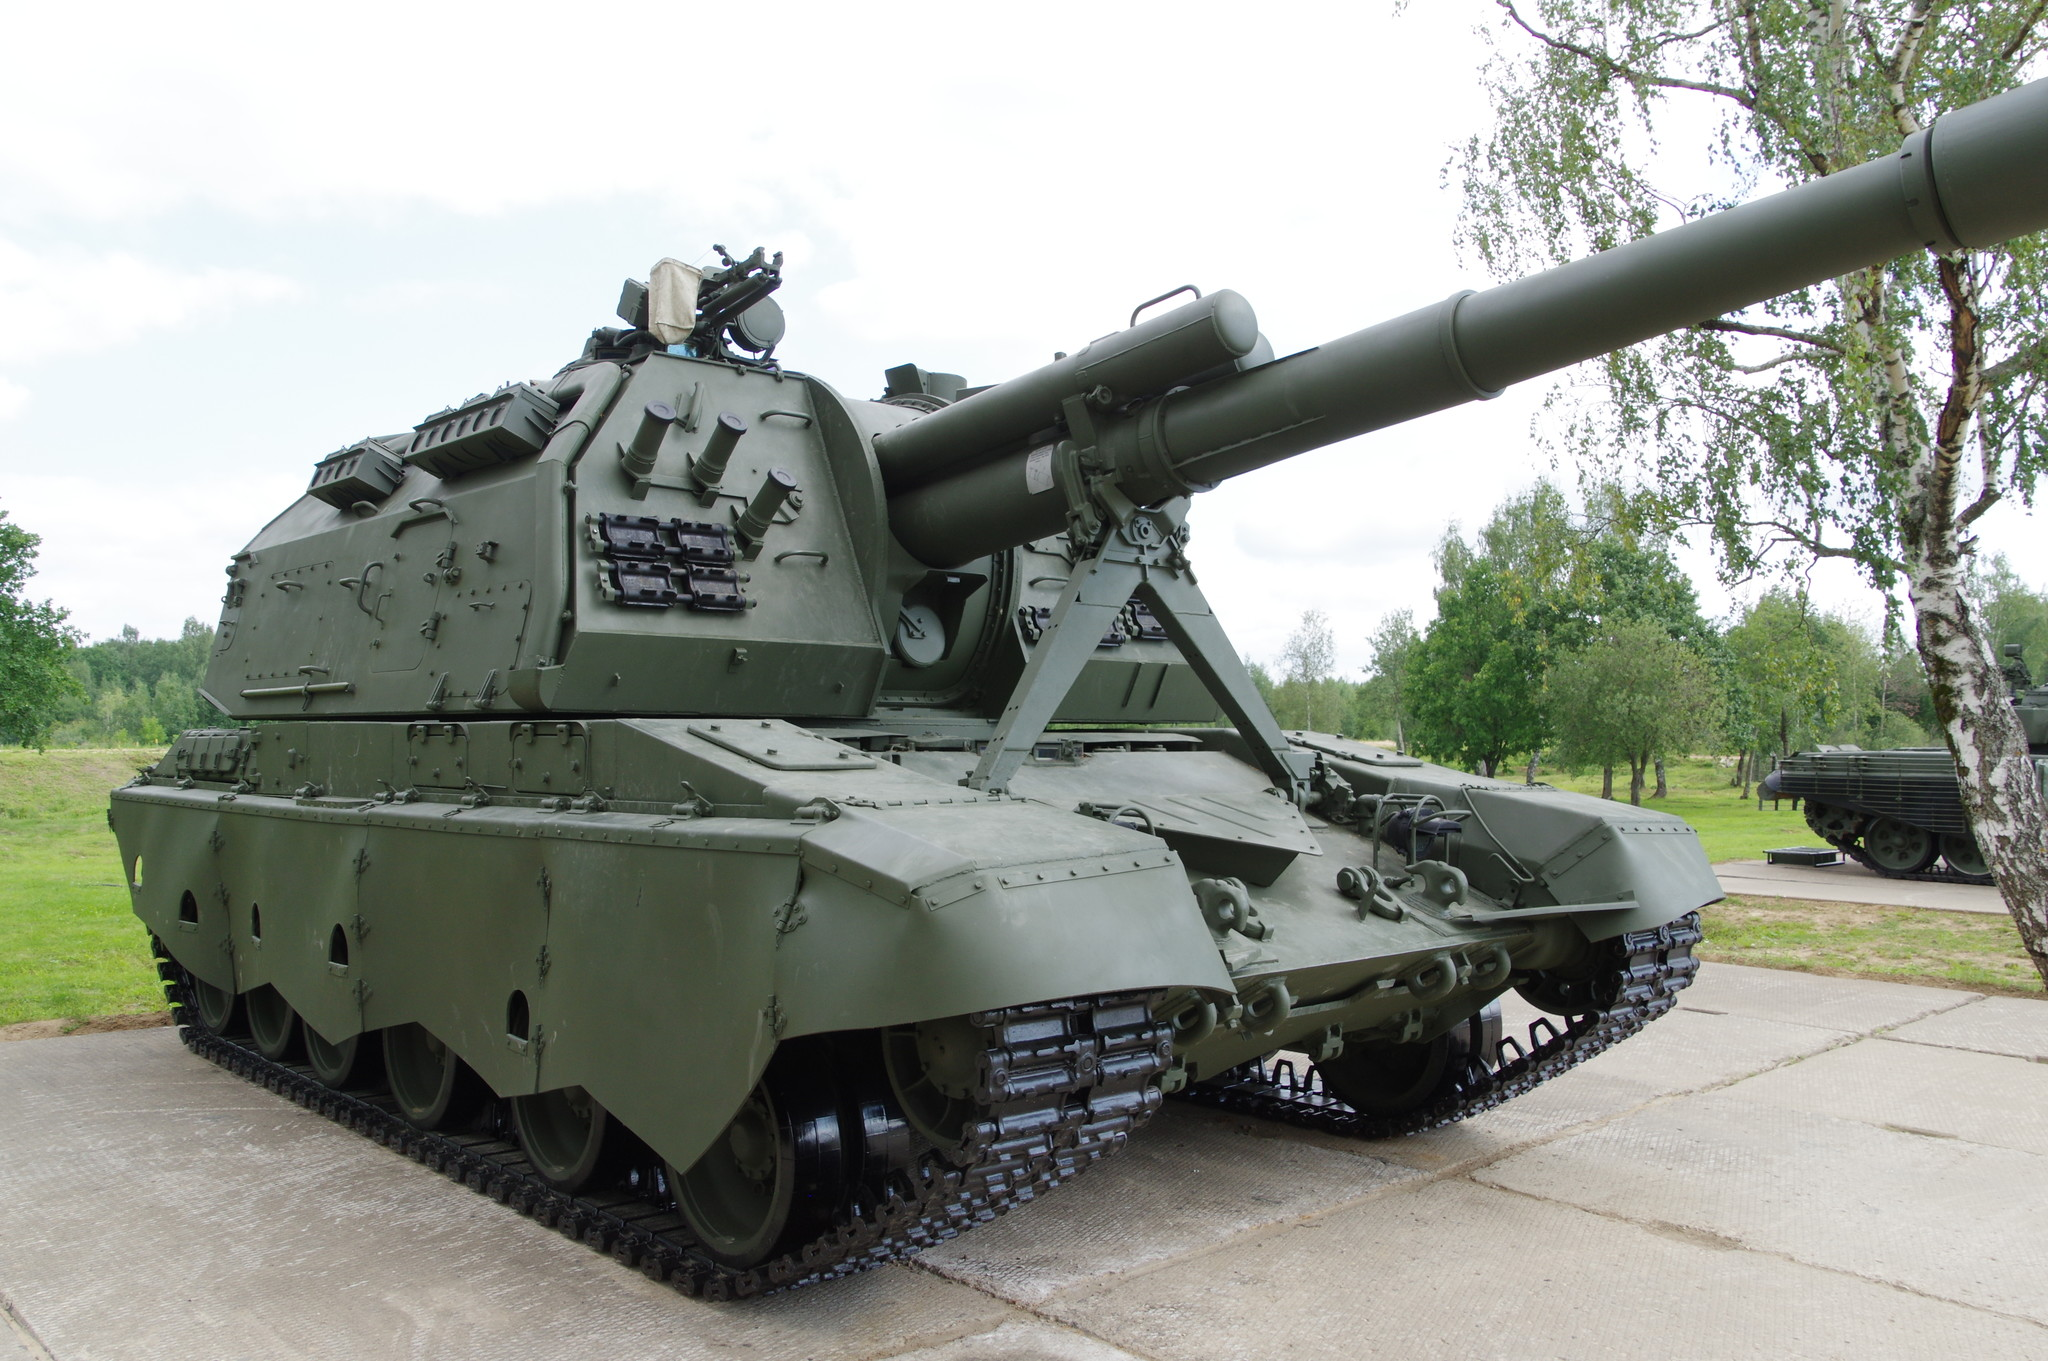 152-мм самоходная гаубица 2С19 «Мста-С»